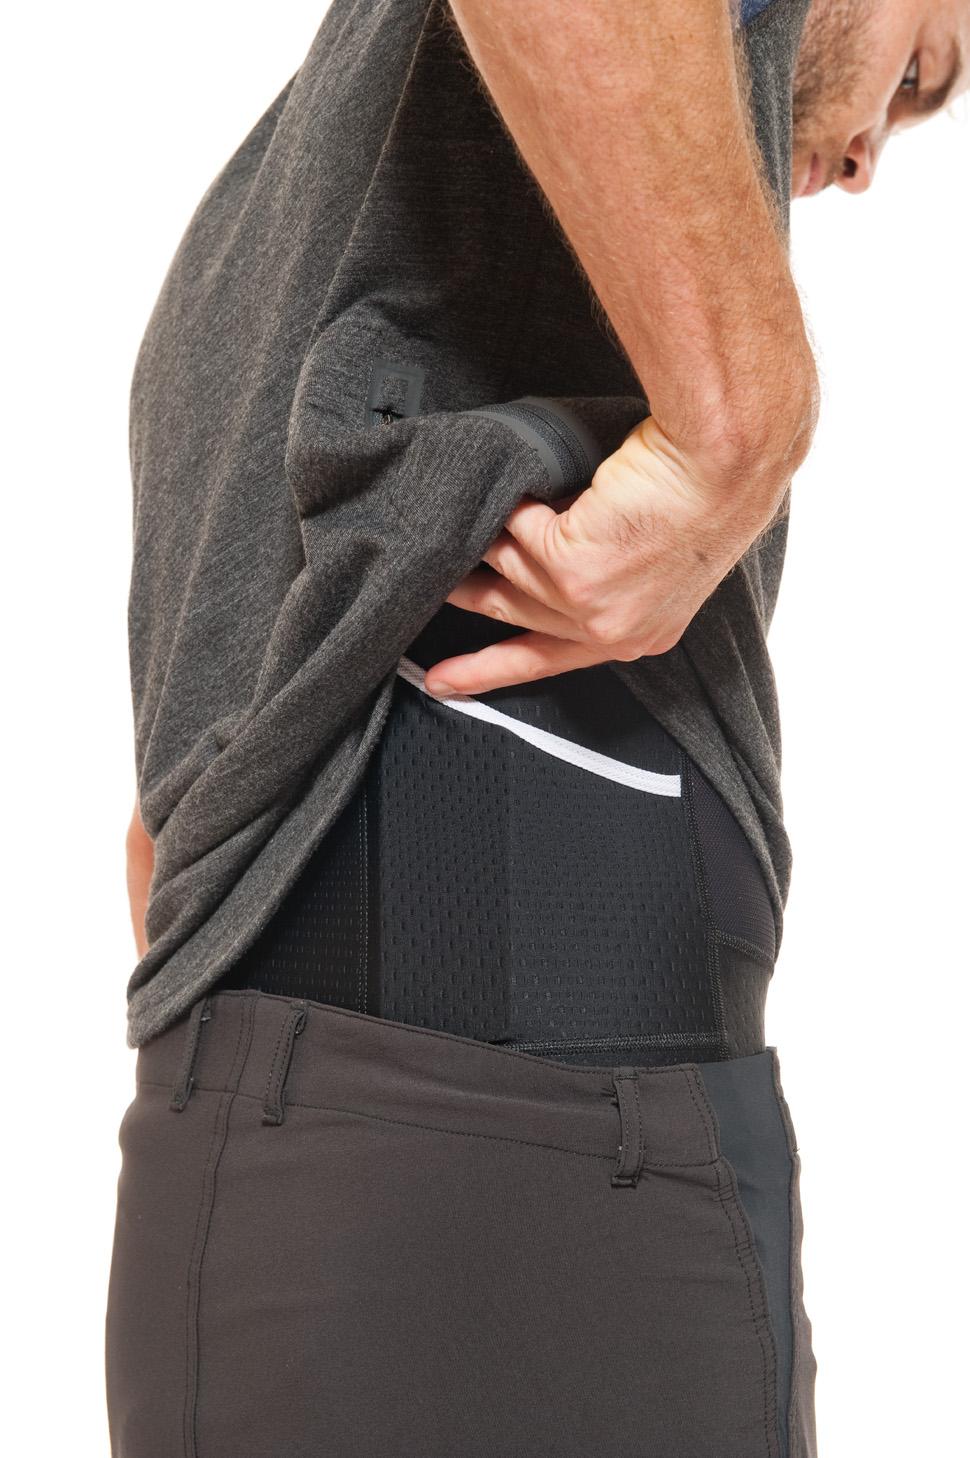 Shorts inside shorts